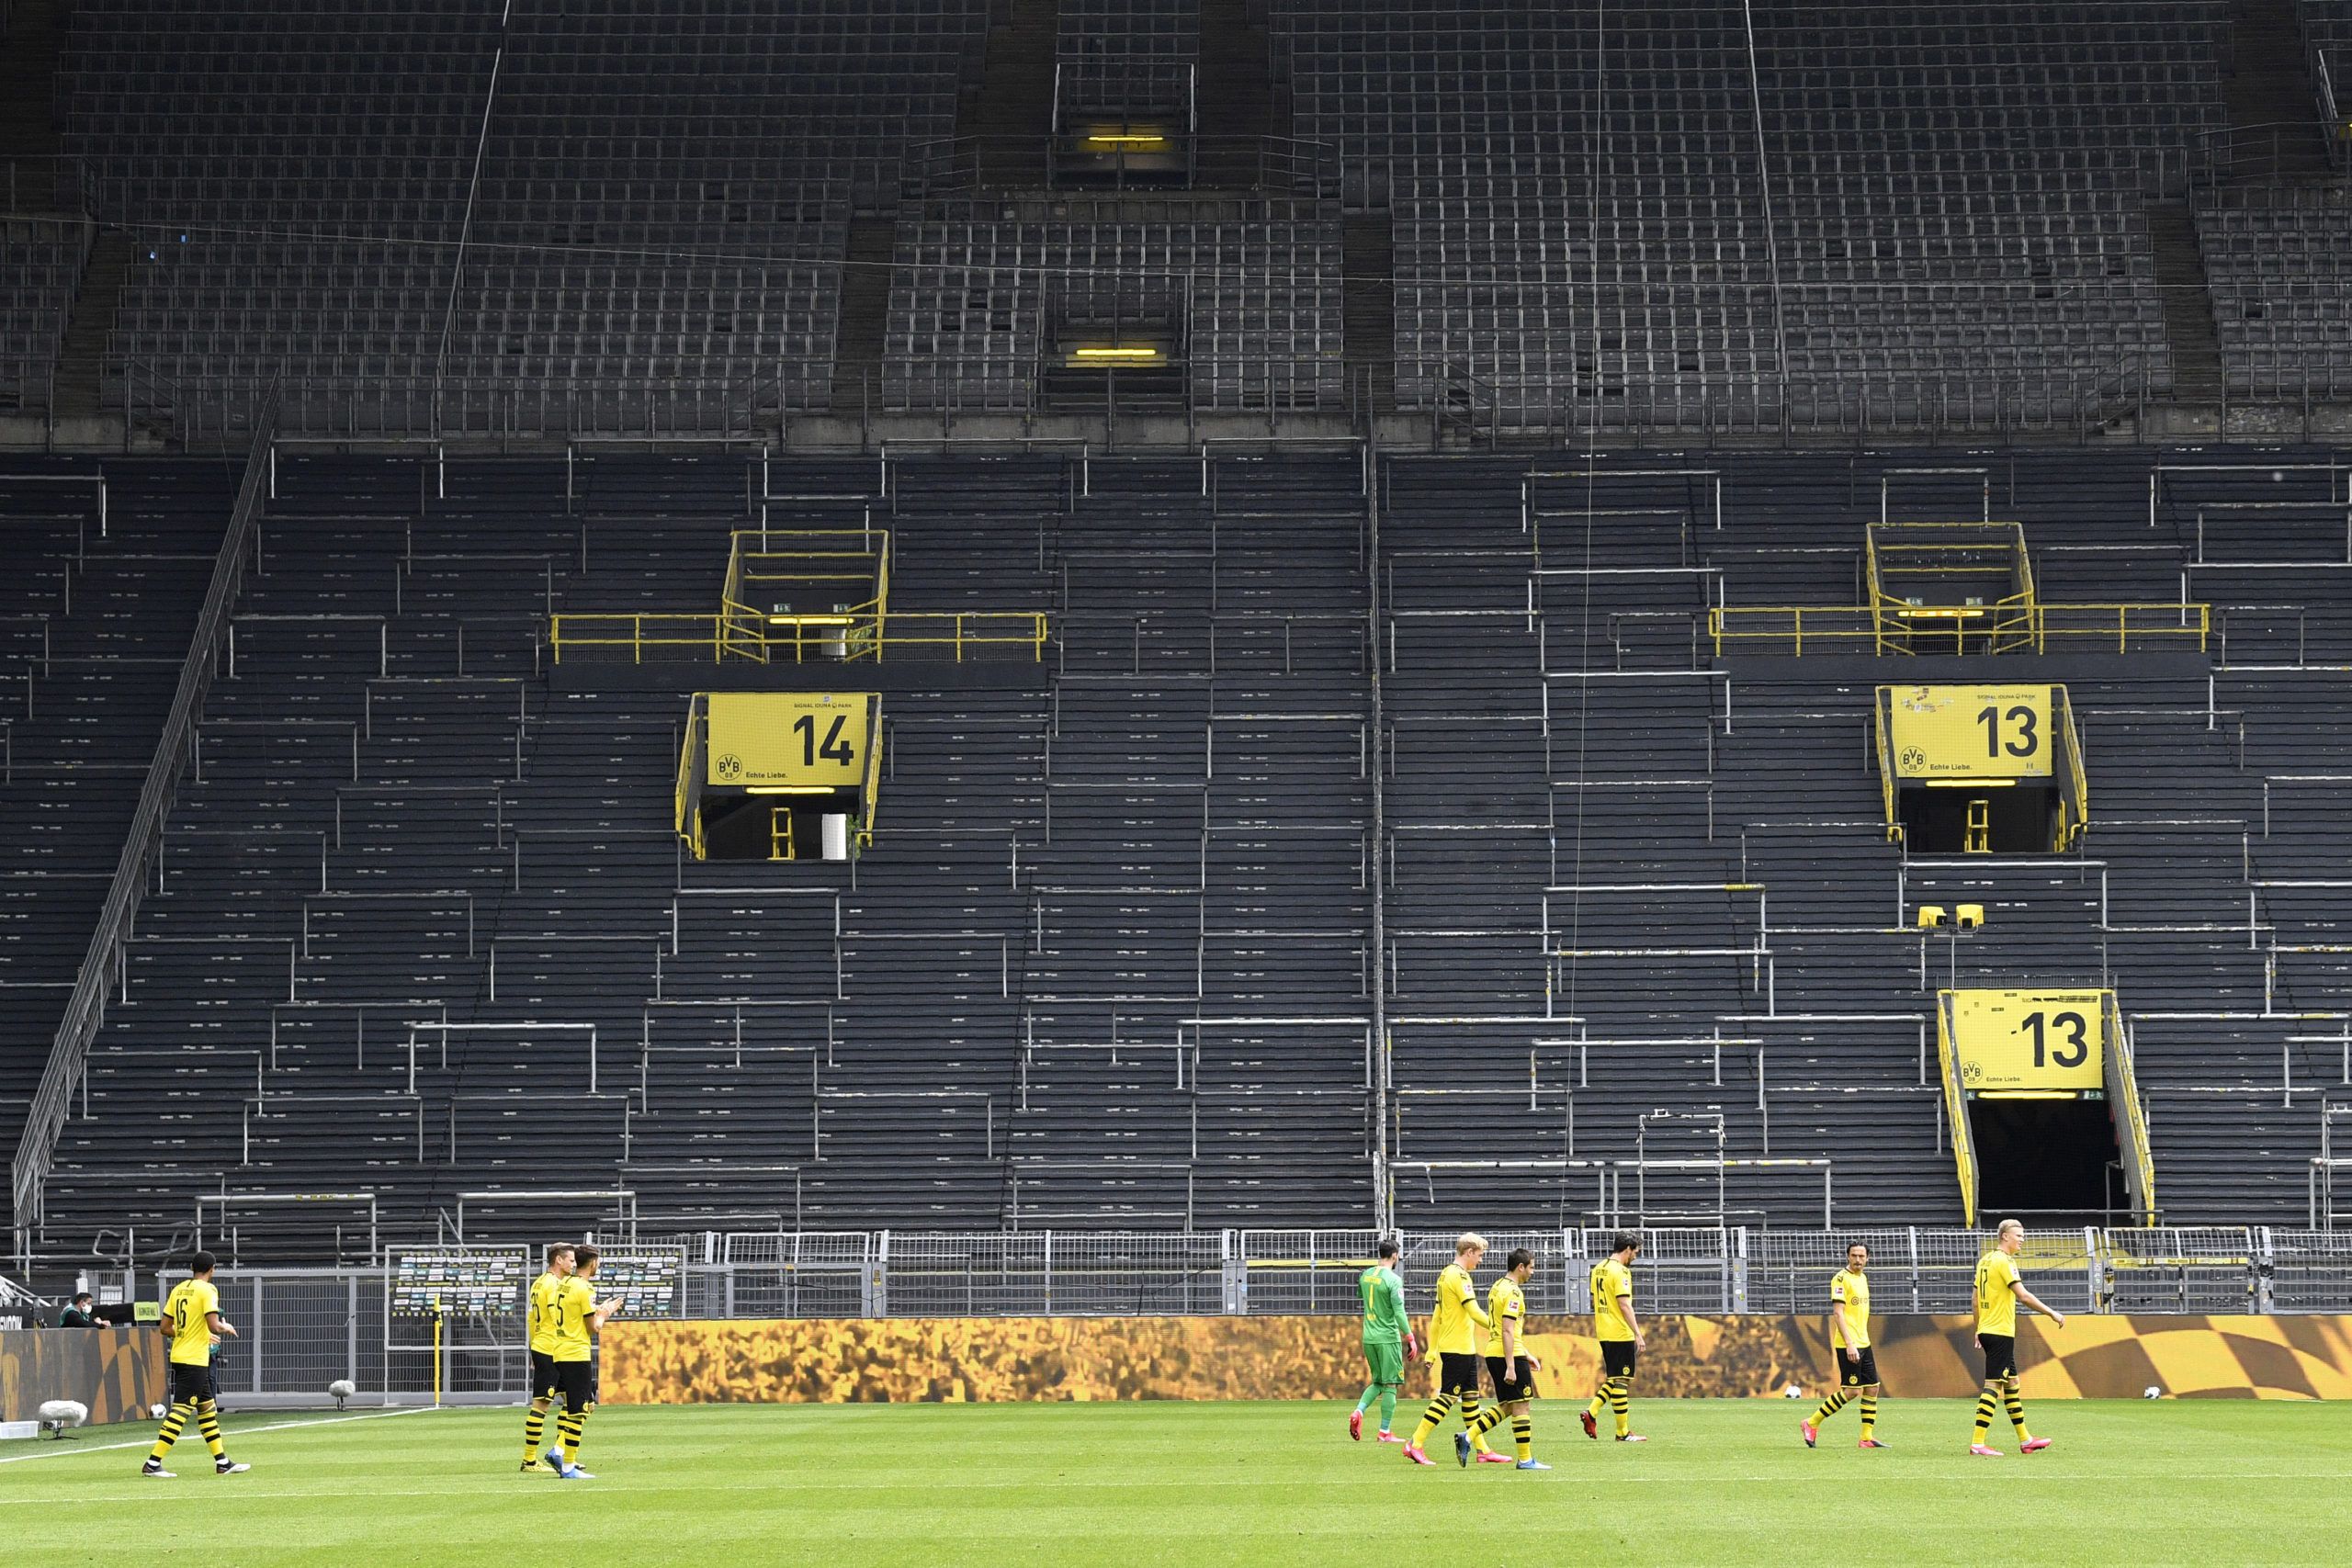 Máskor Dortmundban 80 ezer ember tombol